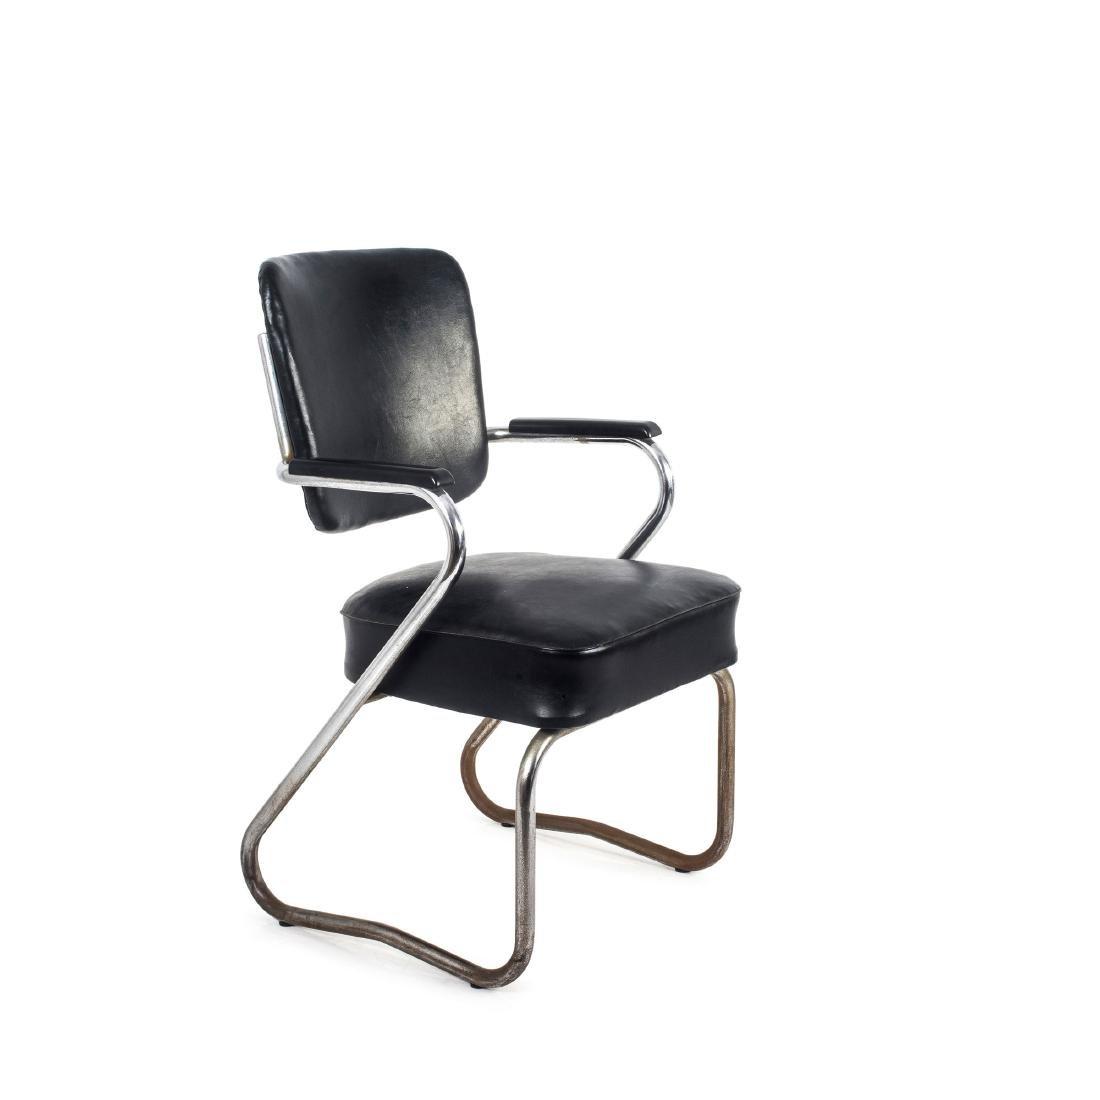 Tubular steel chair, c. 1935